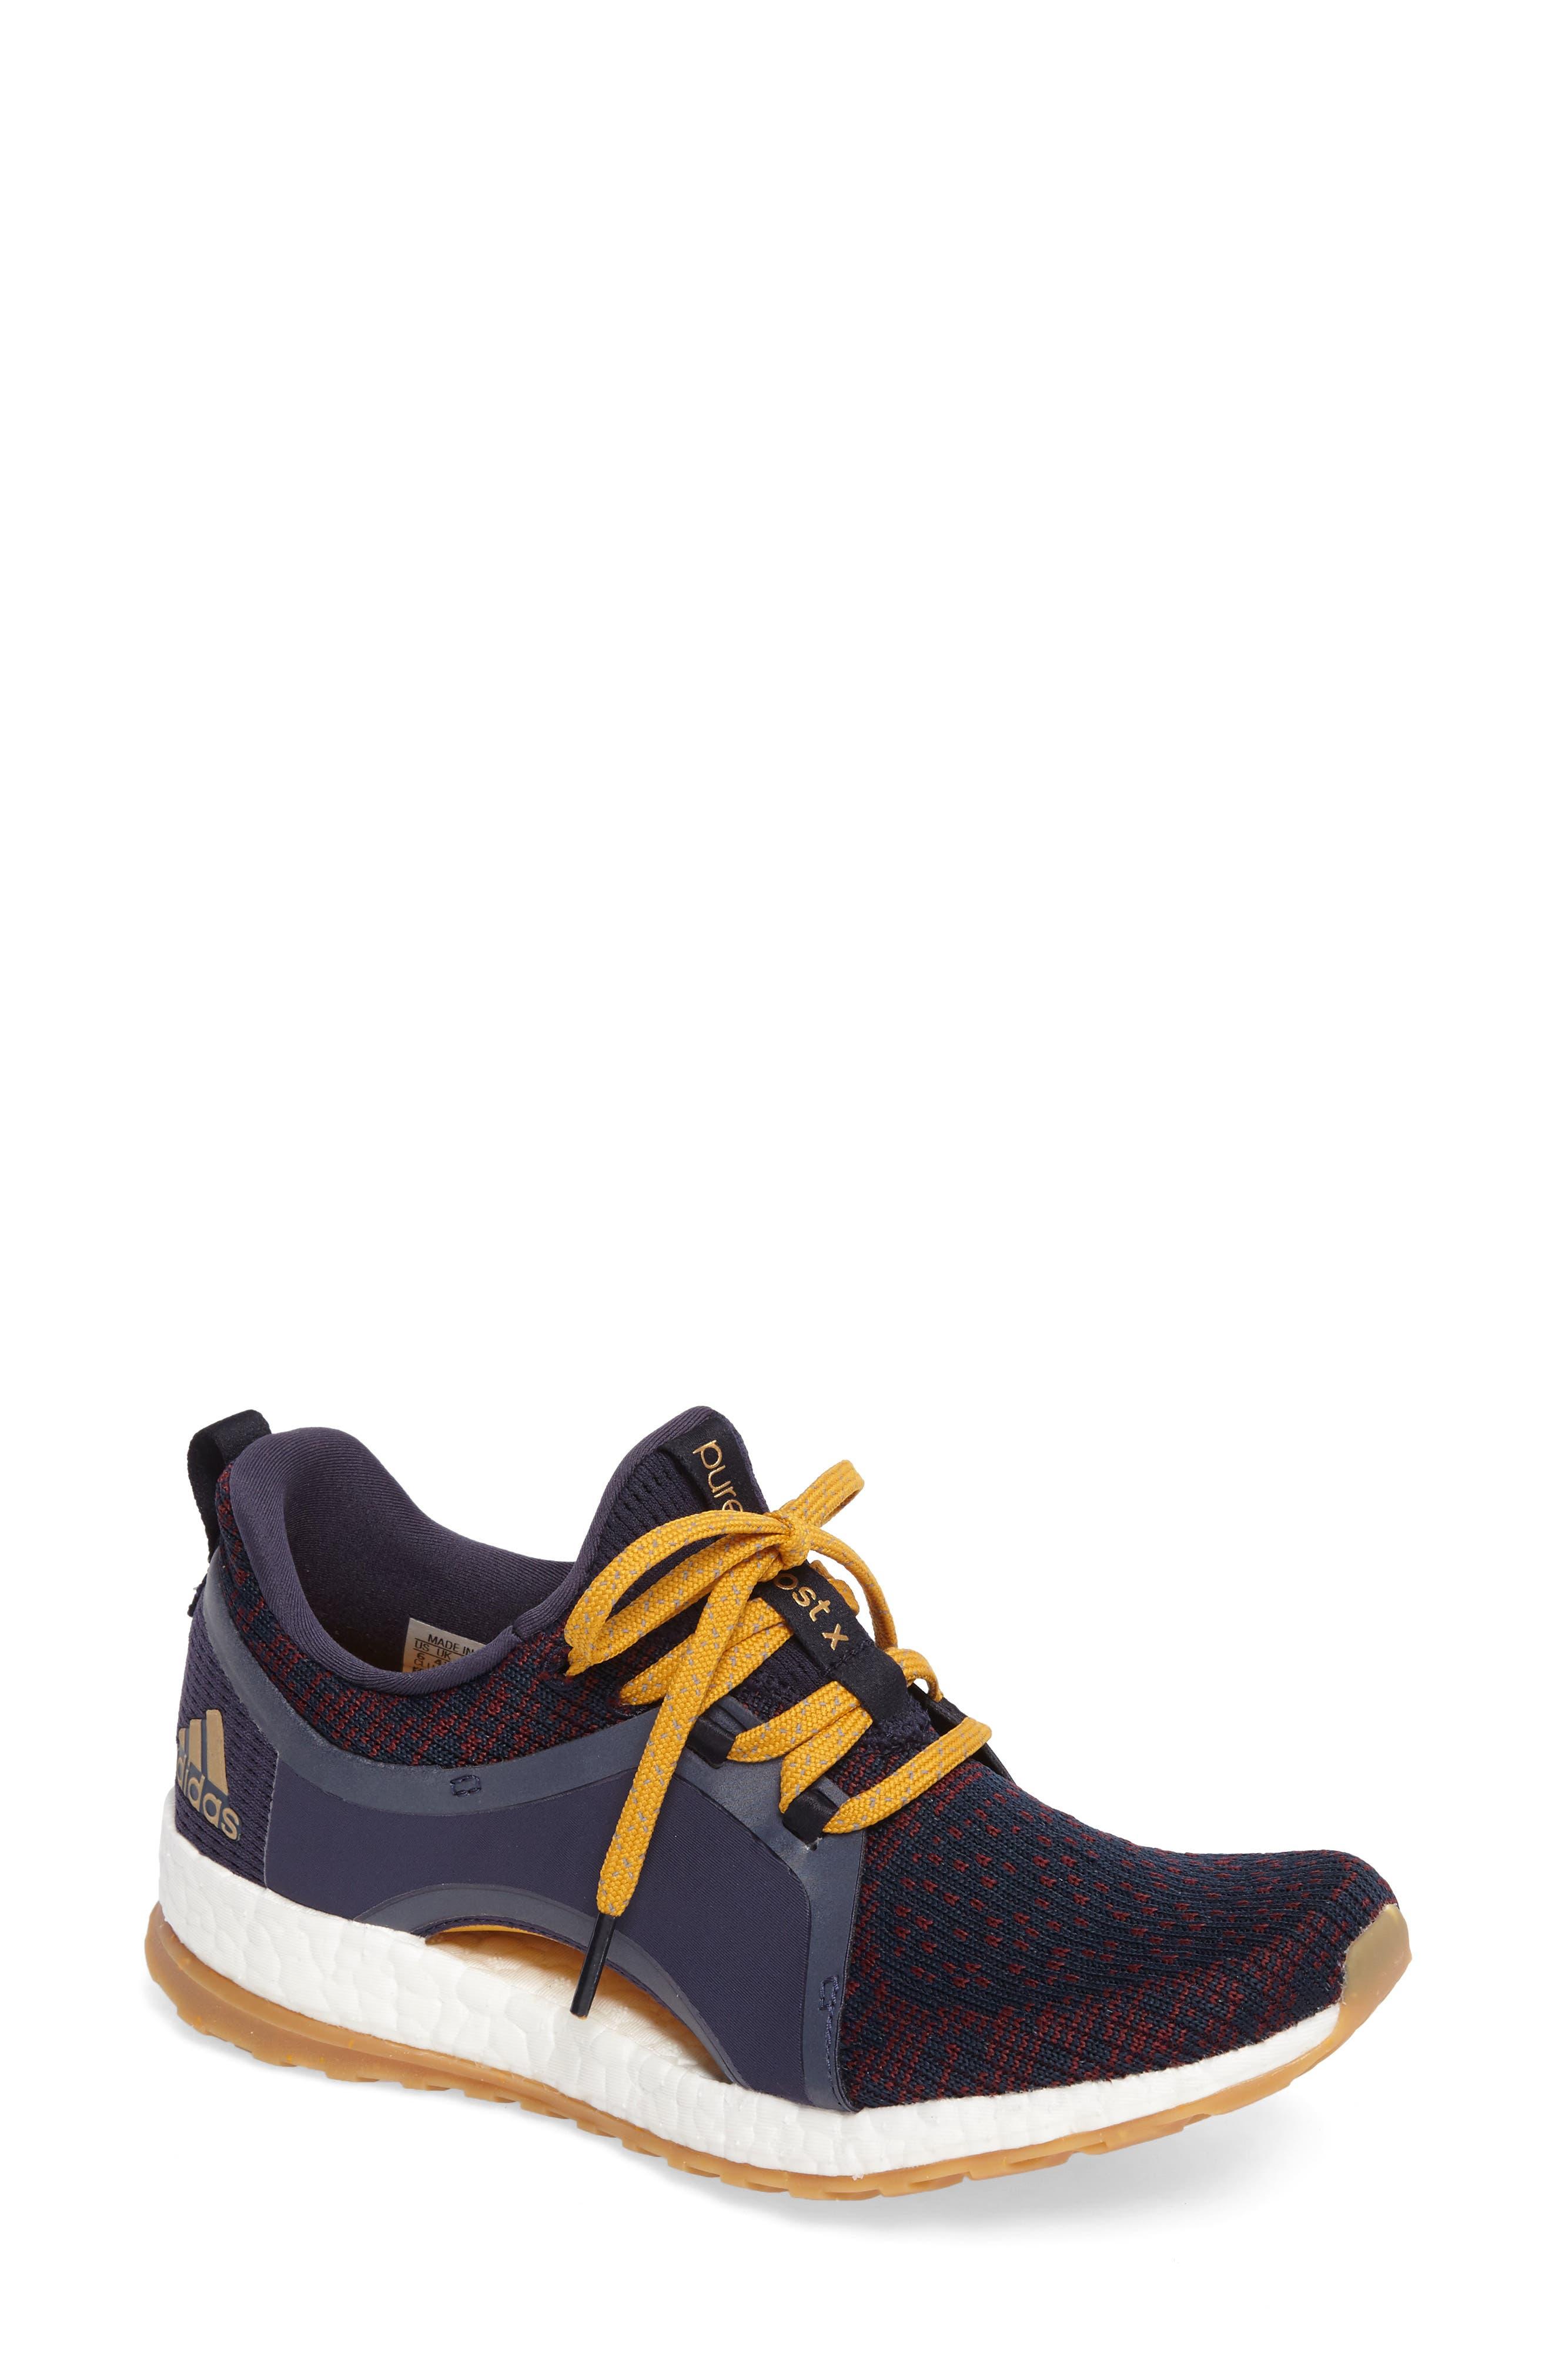 PureBoost X ATR Running Shoe,                         Main,                         color, 408